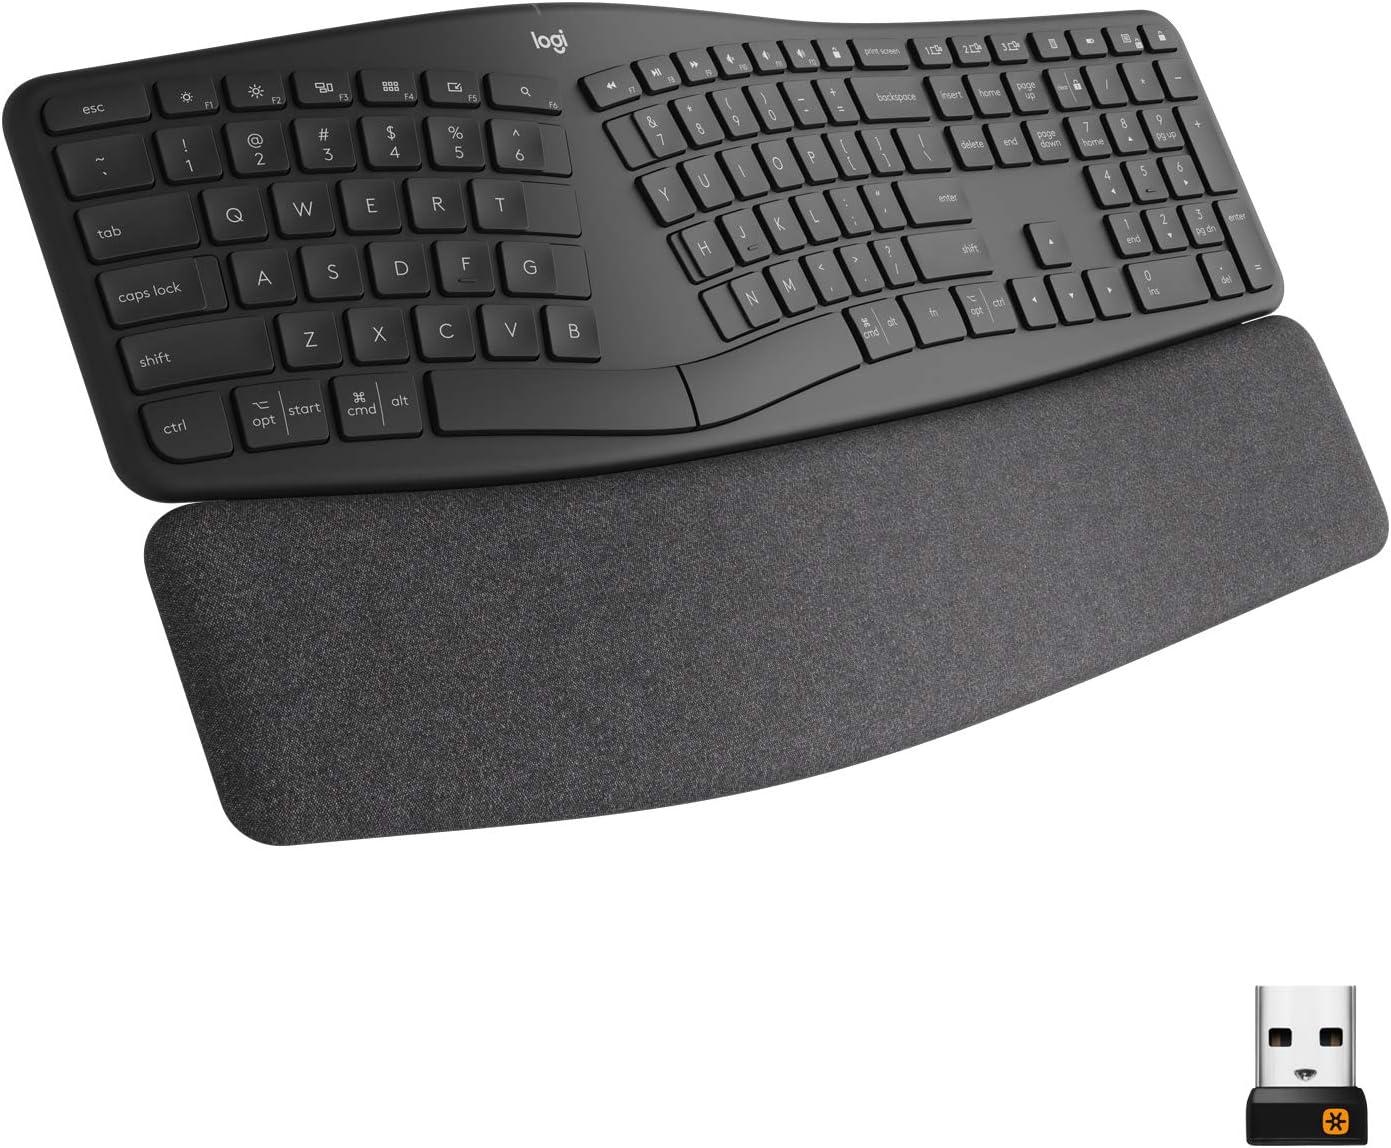 Logitech Ergo K860 Wireless Ergonomic Keyboard with Wrist Rest - Split Keyboard Layout for Windows/Mac, Bluetooth or USB Connectivity